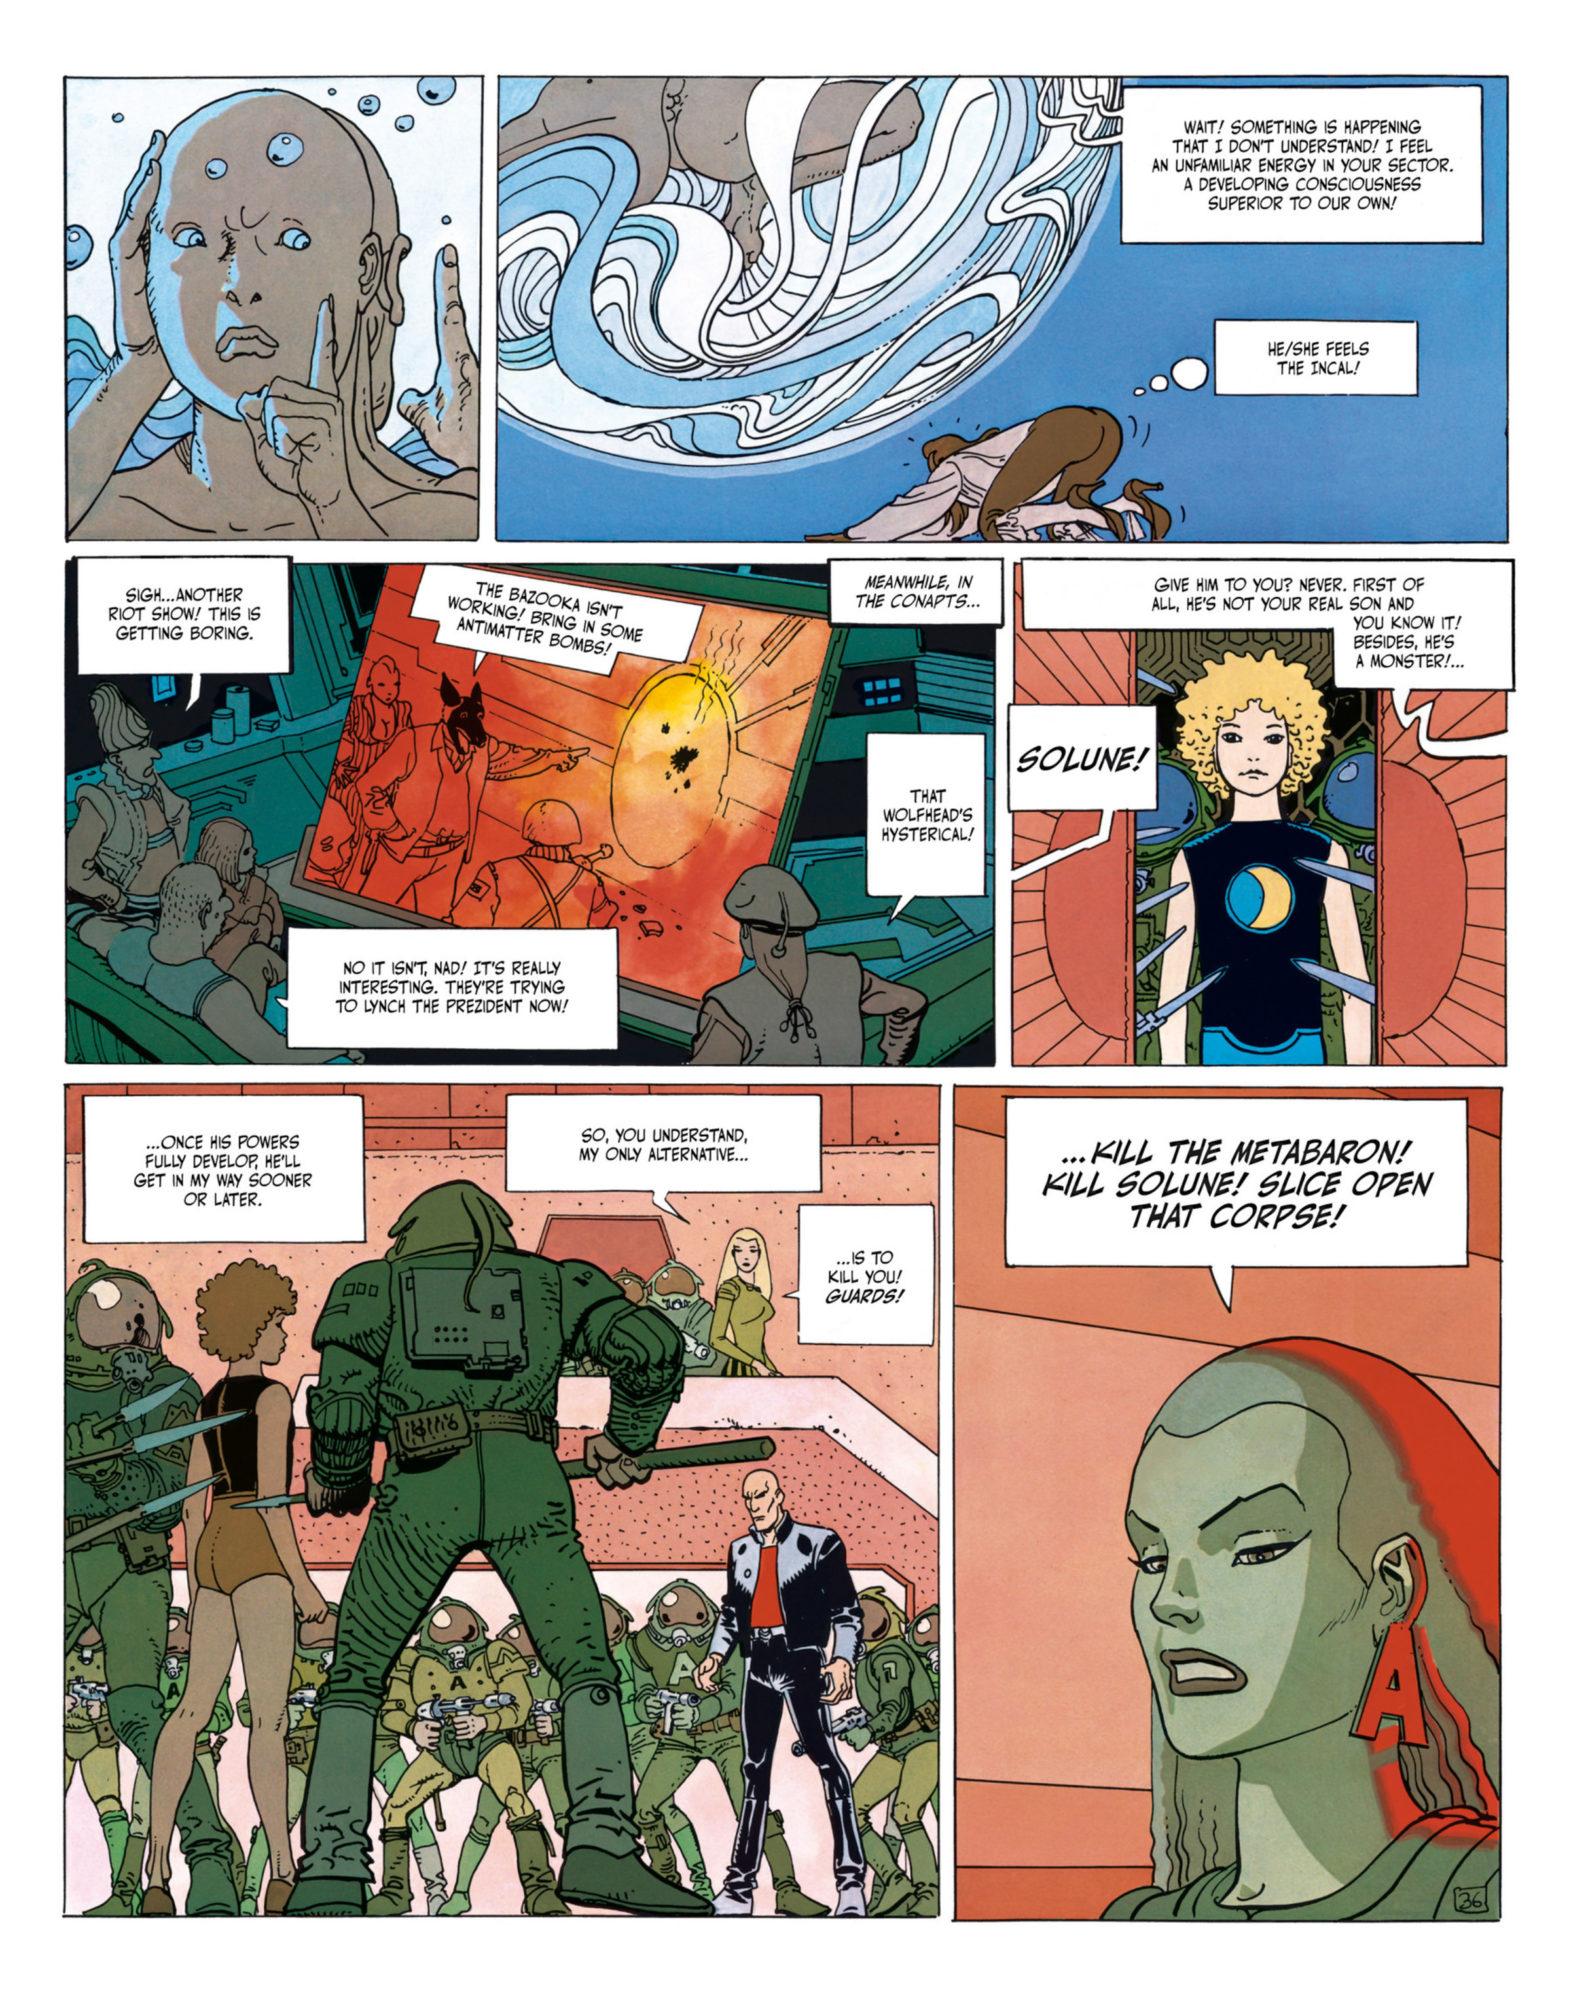 The Incal - Metabaron encounters Tanatah